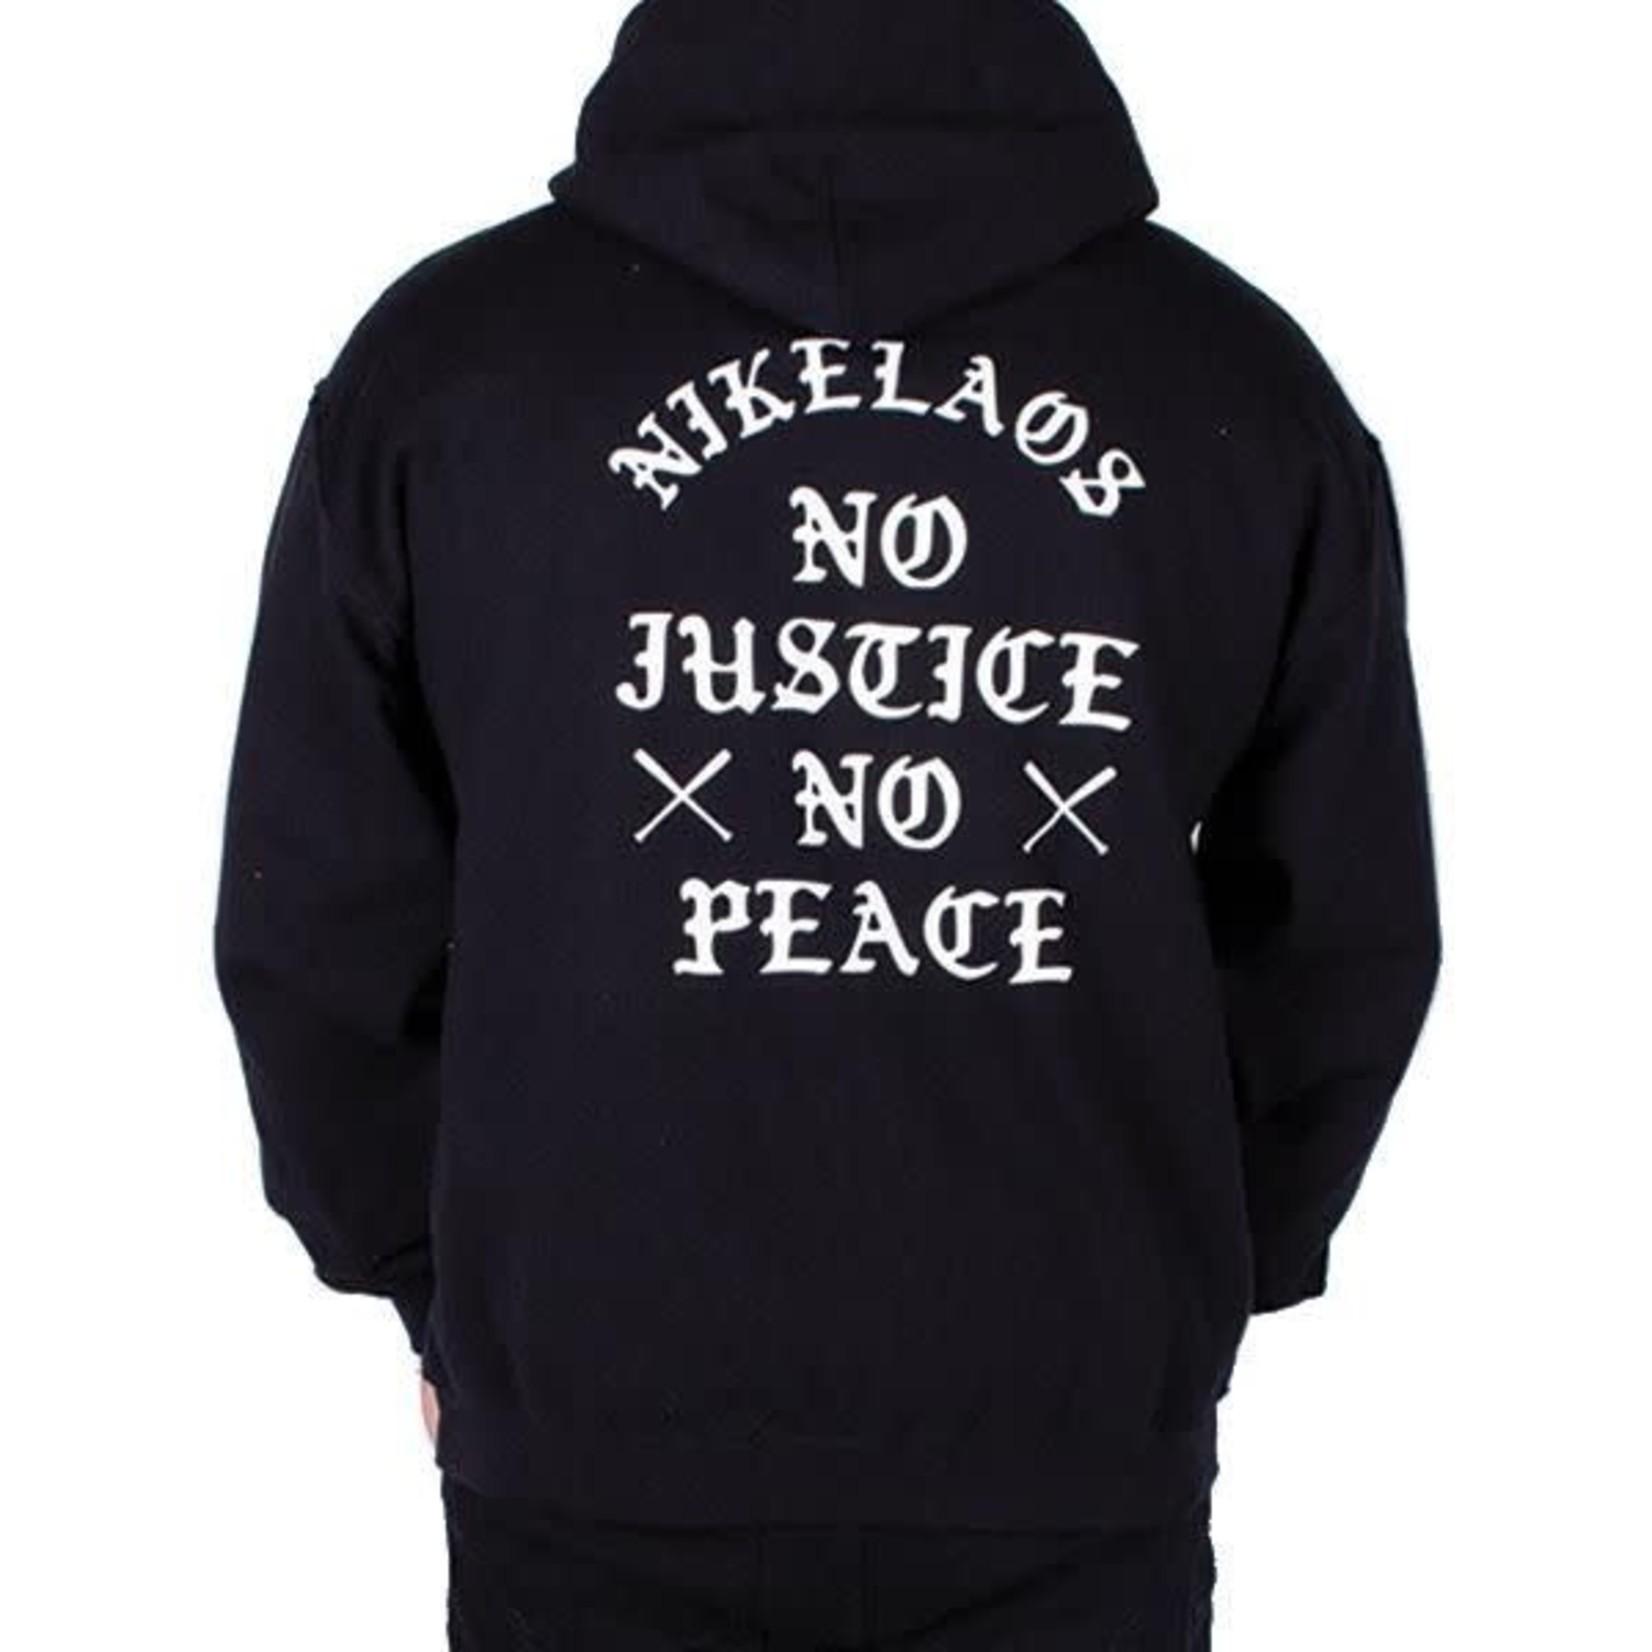 NKLS NKLS : No Justice Hoodie